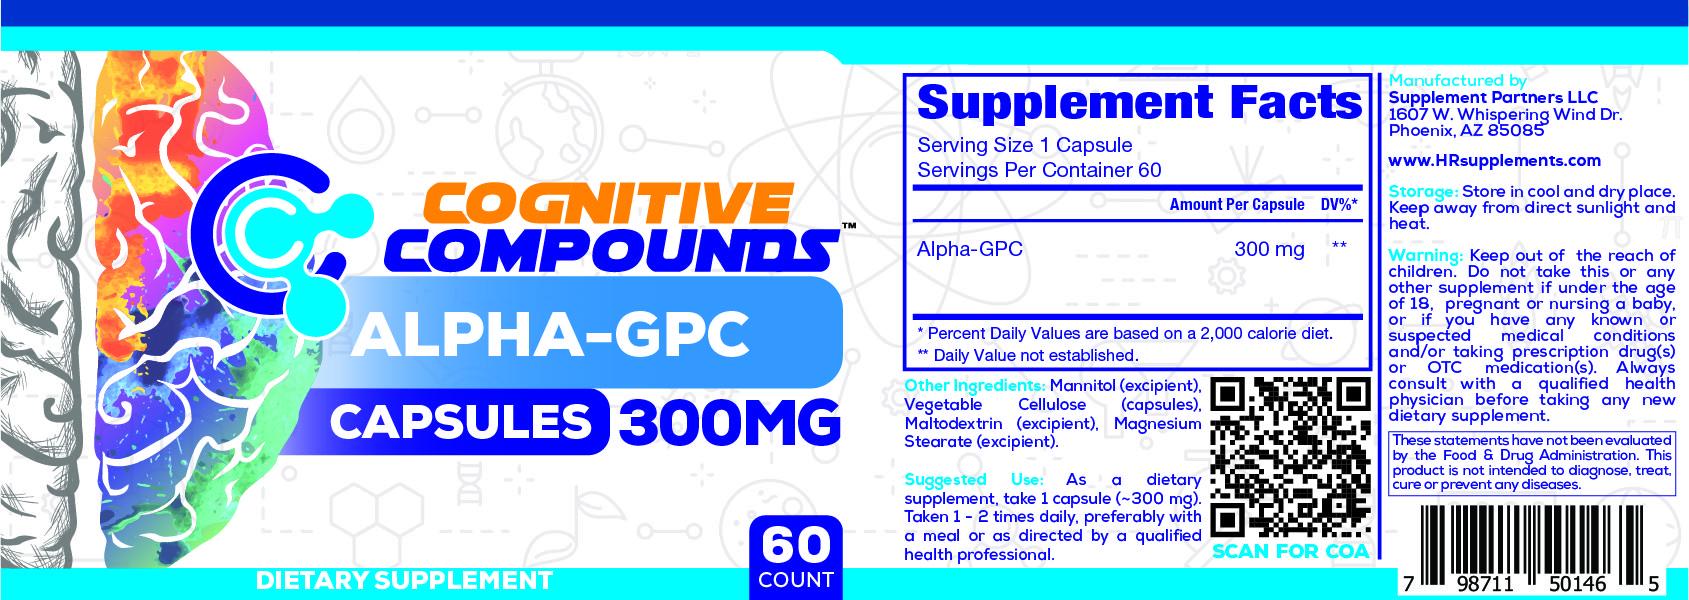 alpha-gpc-60-count.jpg